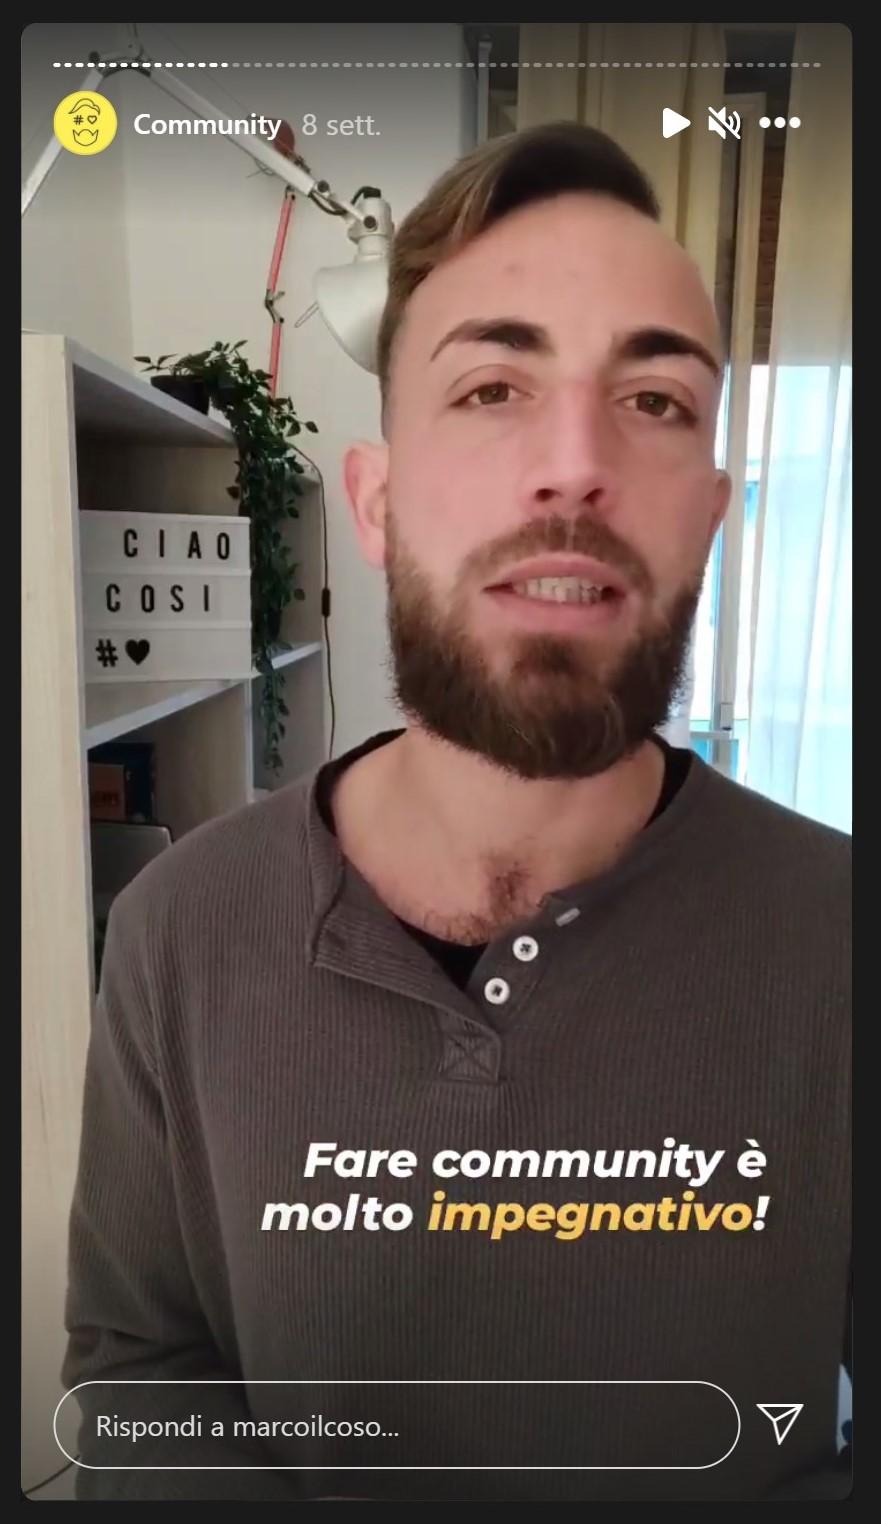 Marco Loris Raitano - Community